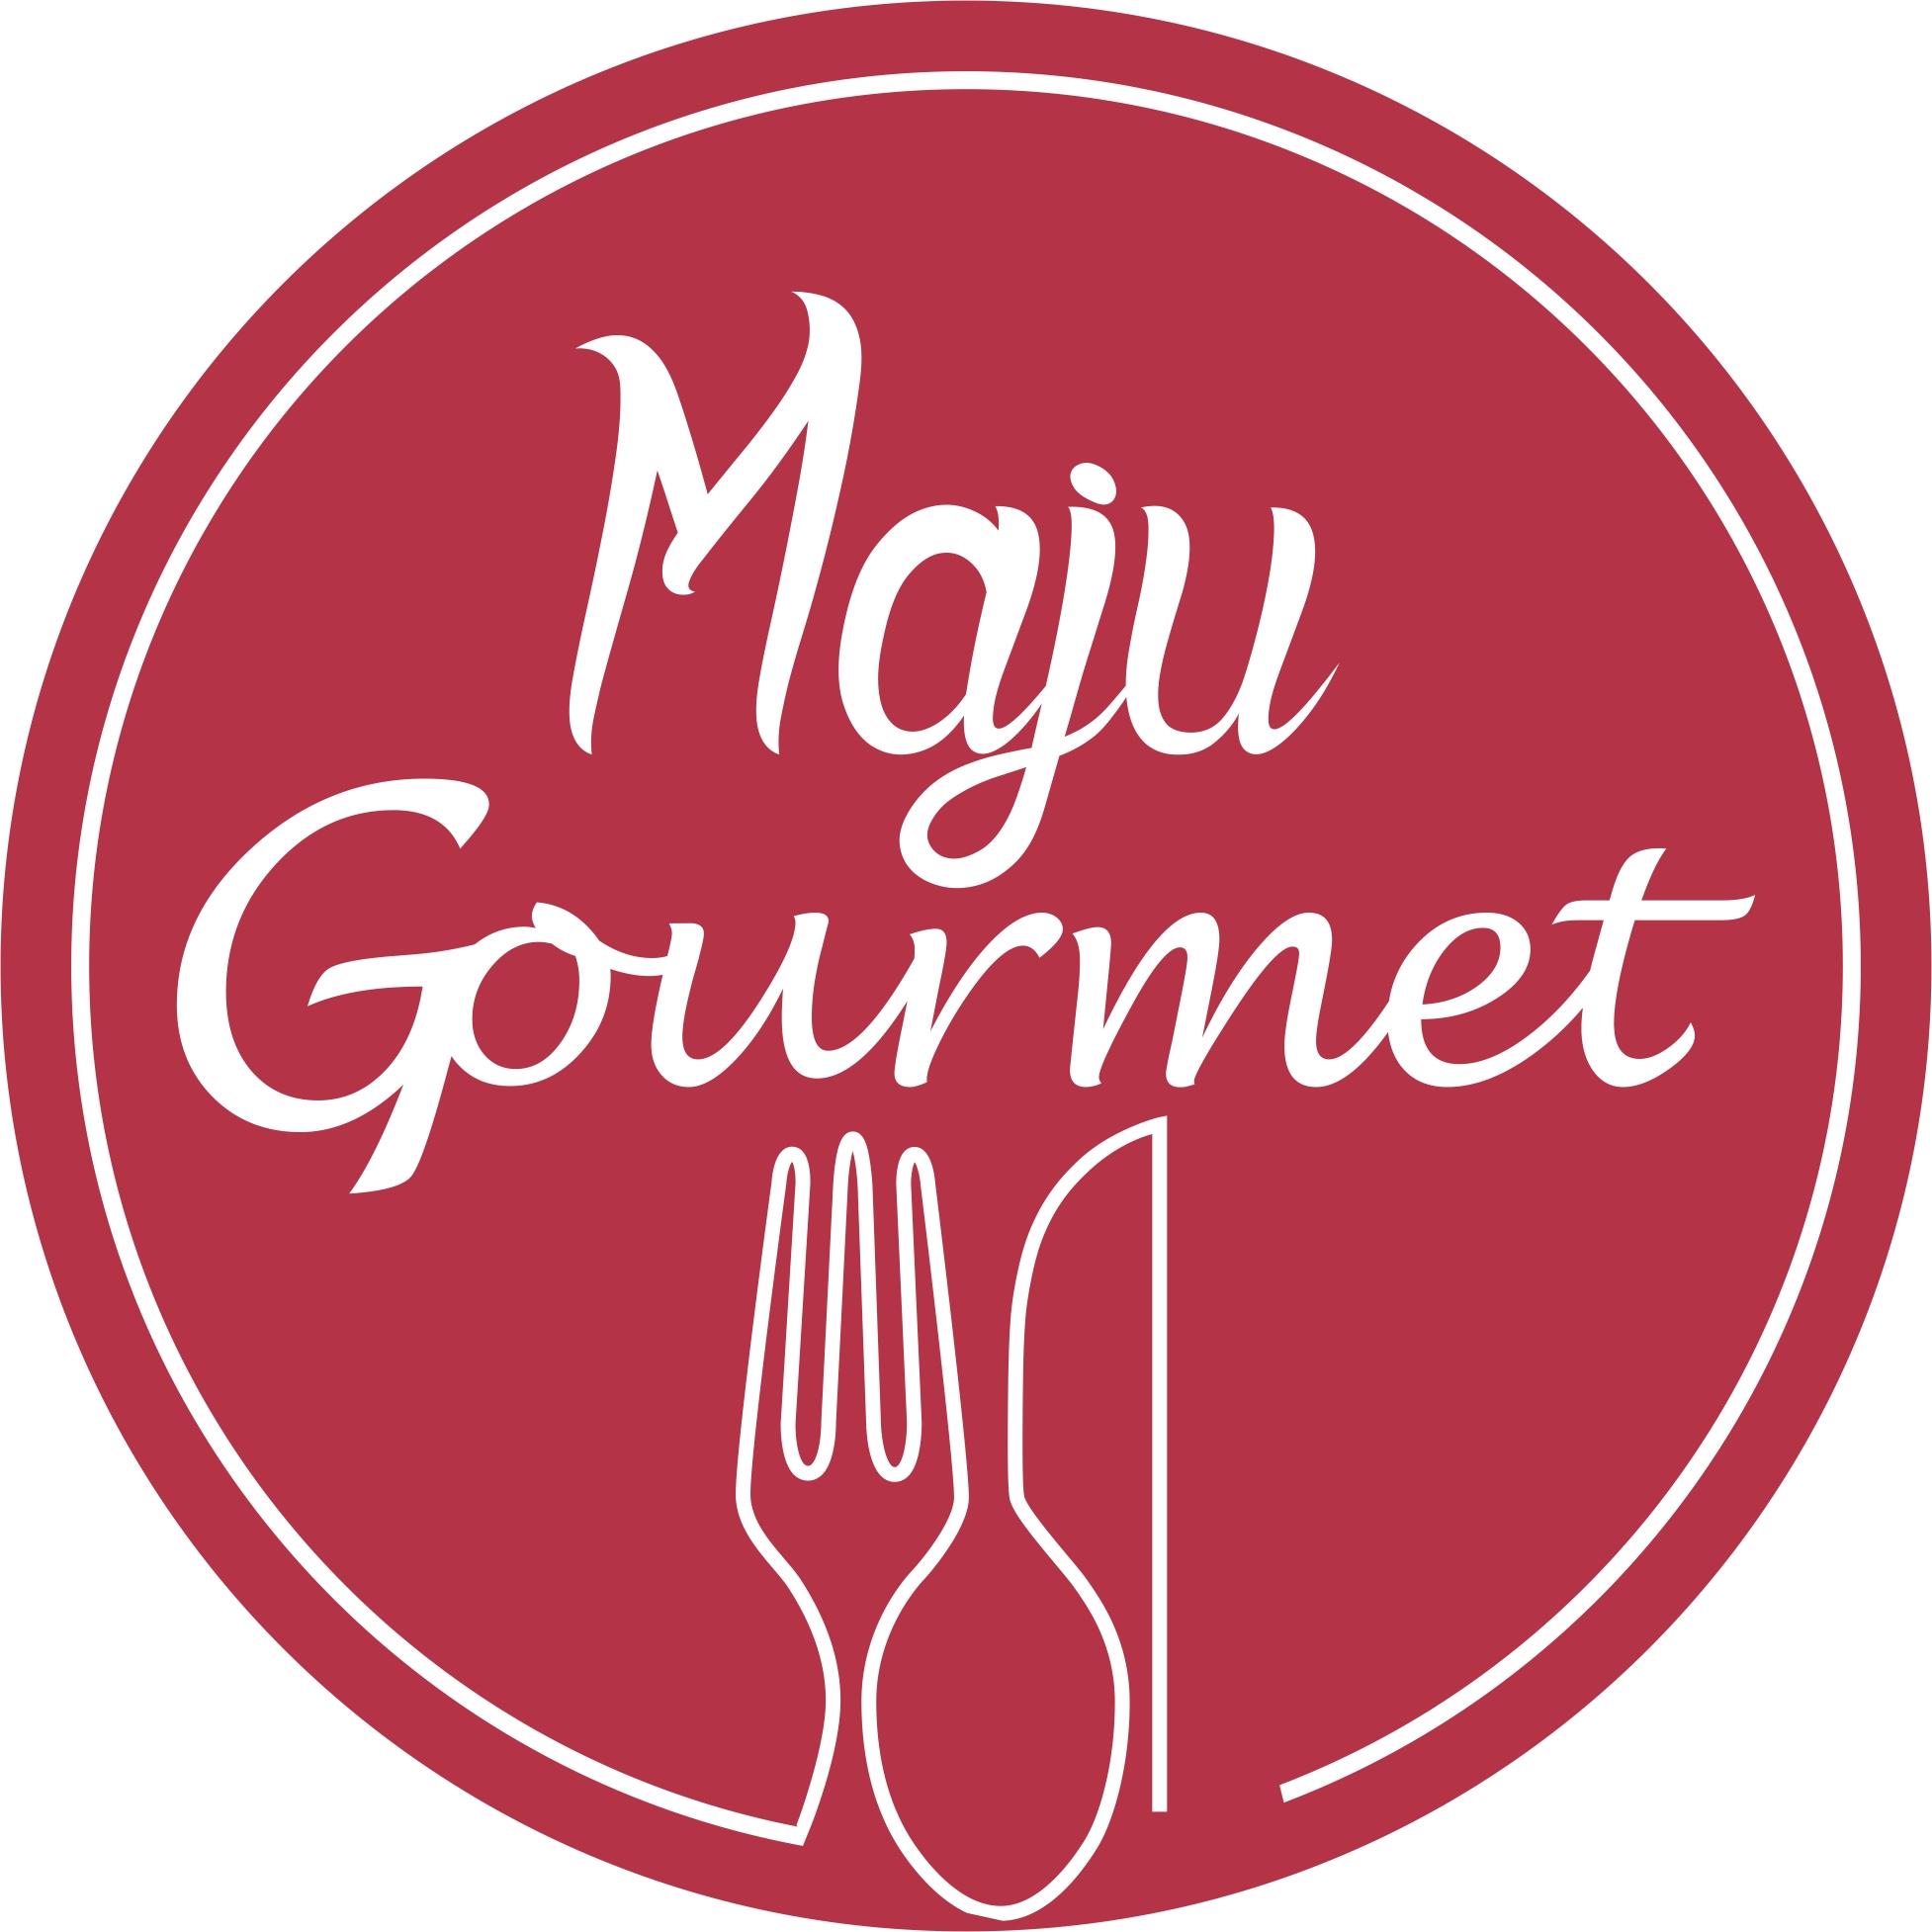 Maju Gourmet Medellin